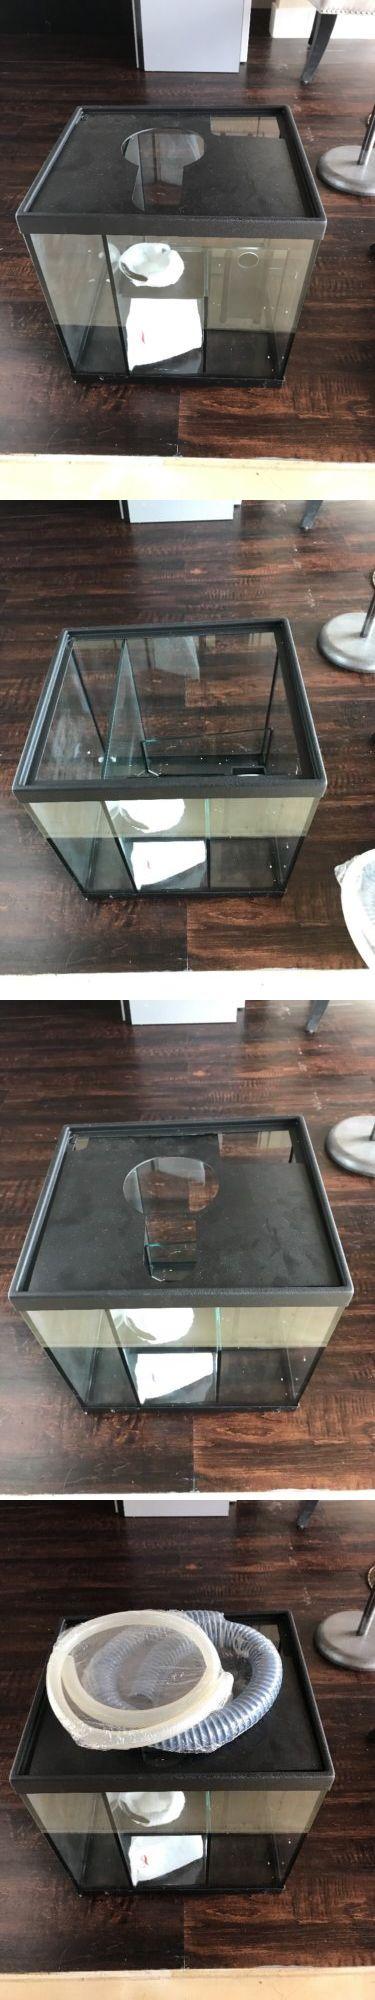 Aquariums and Tanks 20755: Elos Mini Oem Aquarium Filter Glass Sump **Blowout Sale -> BUY IT NOW ONLY: $299.99 on eBay!